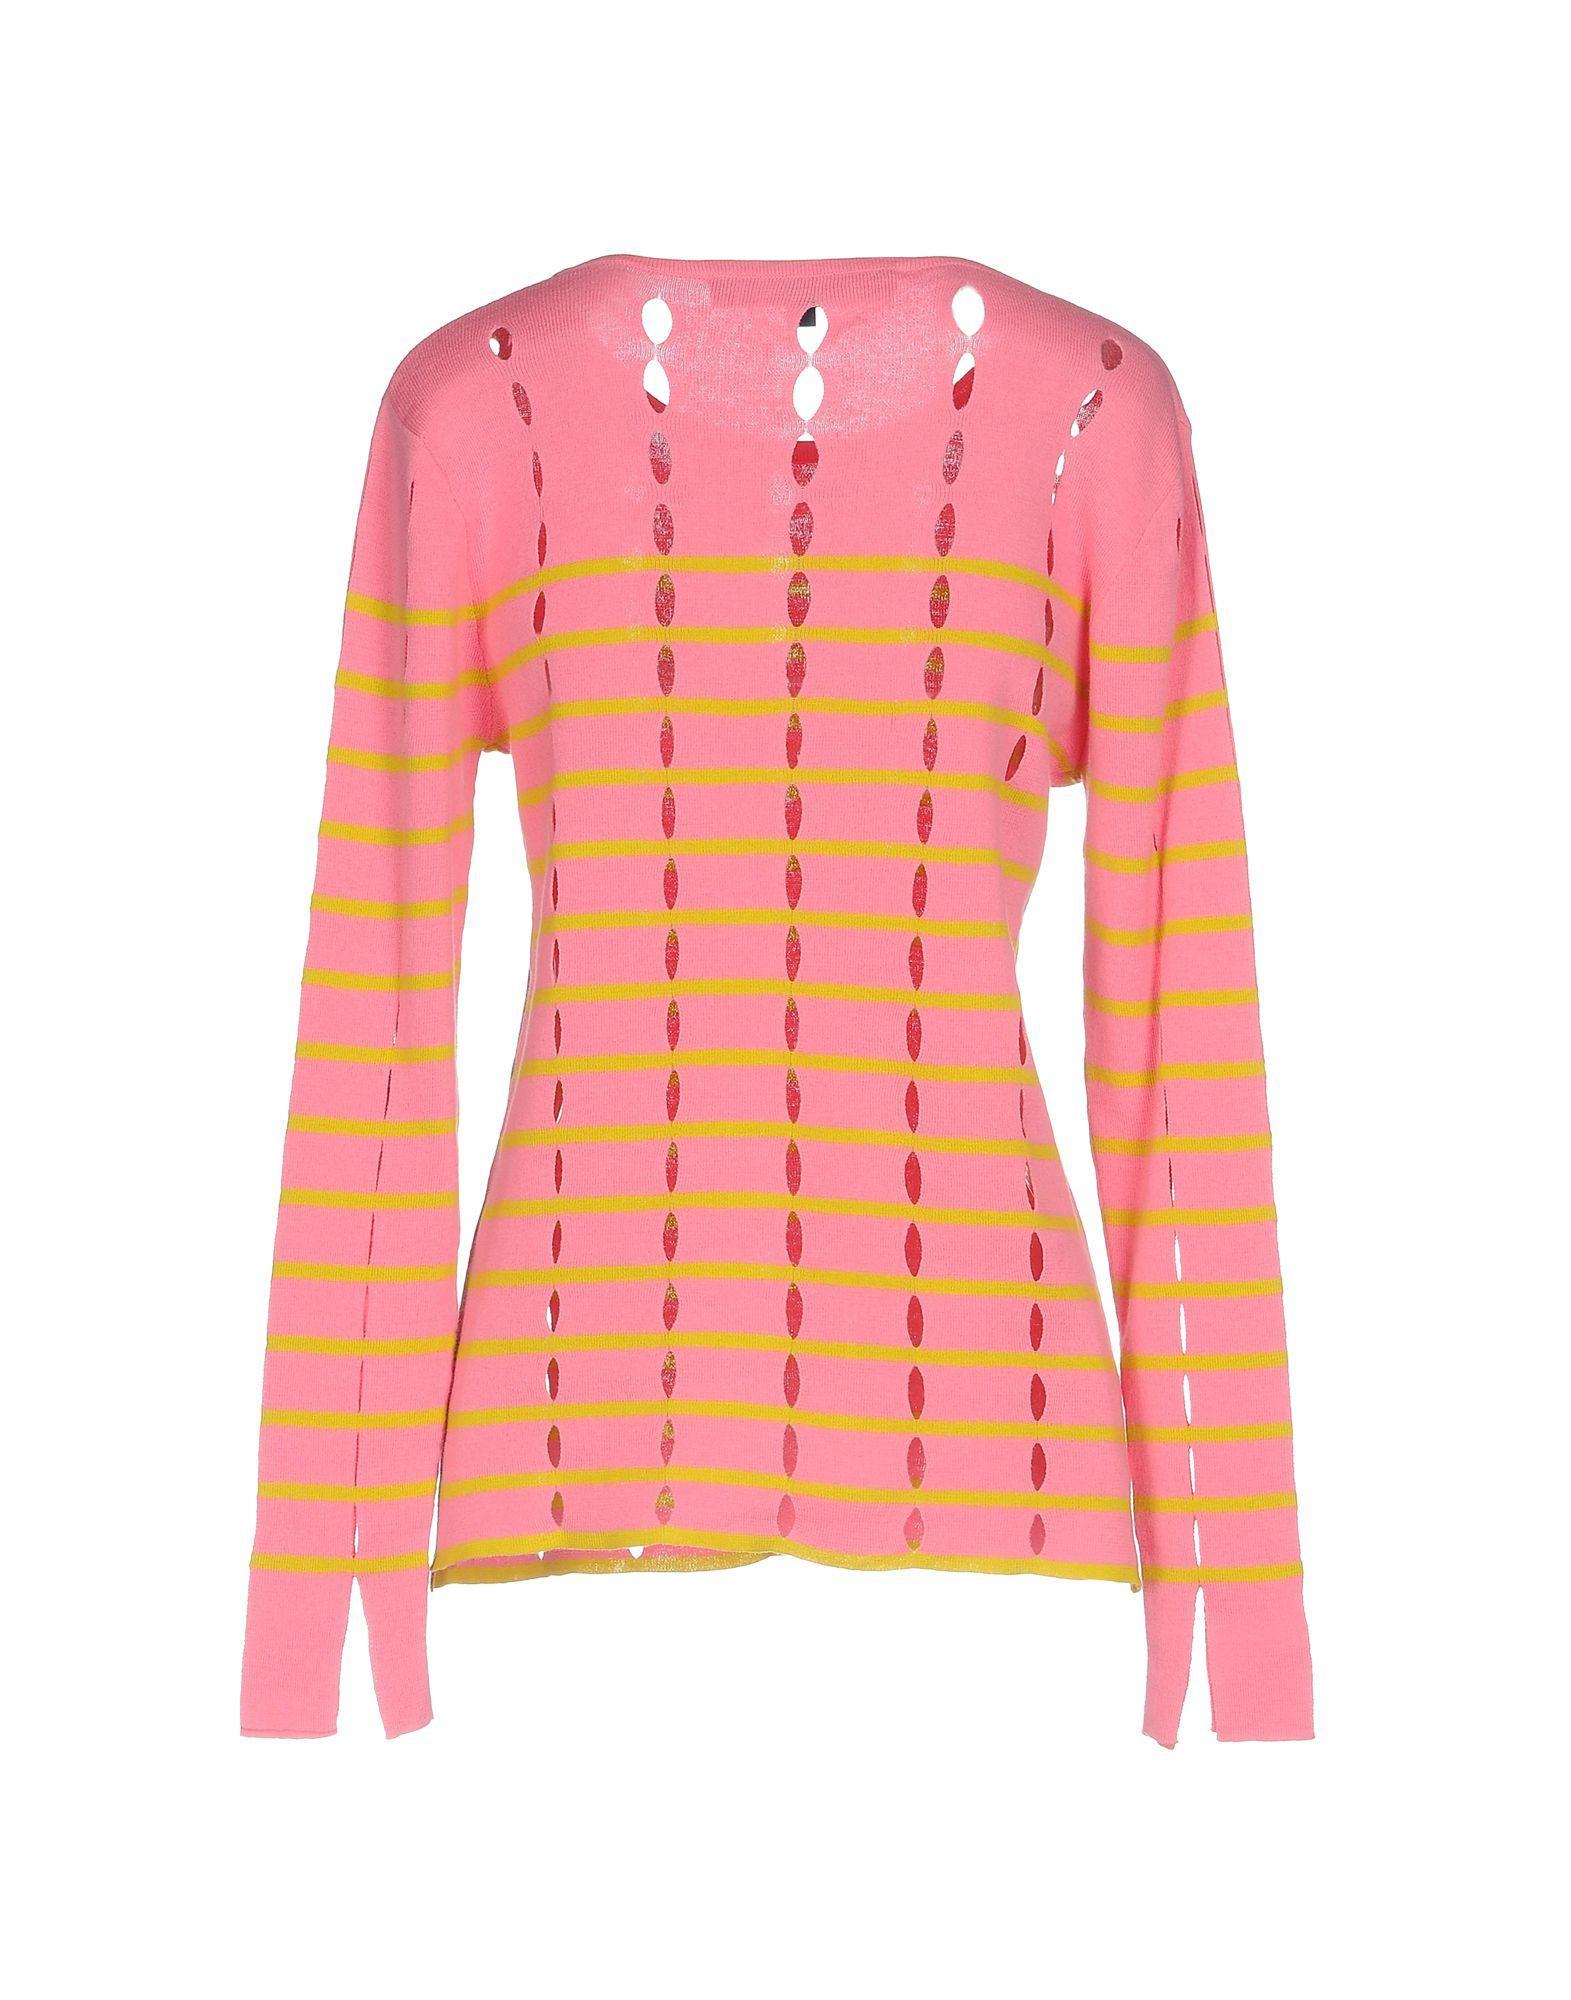 Pullover Coton French Connection en coloris Rose